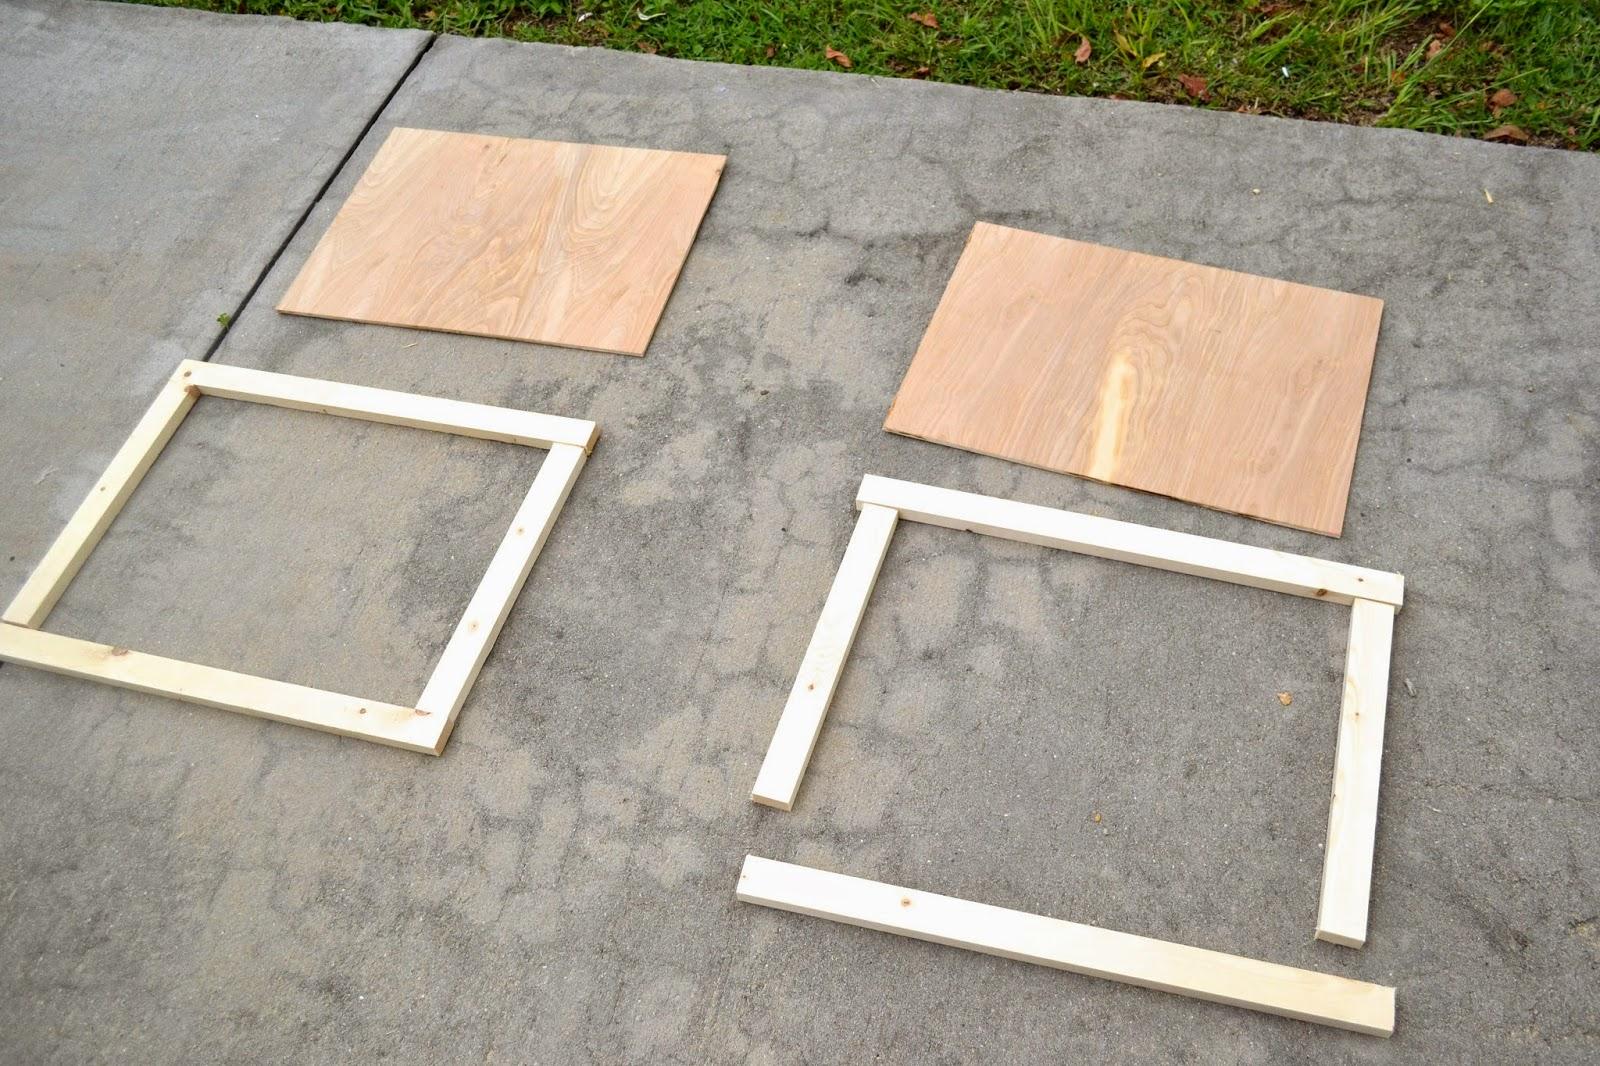 CK And Nate Header: DIY Simple Cabinet Doors